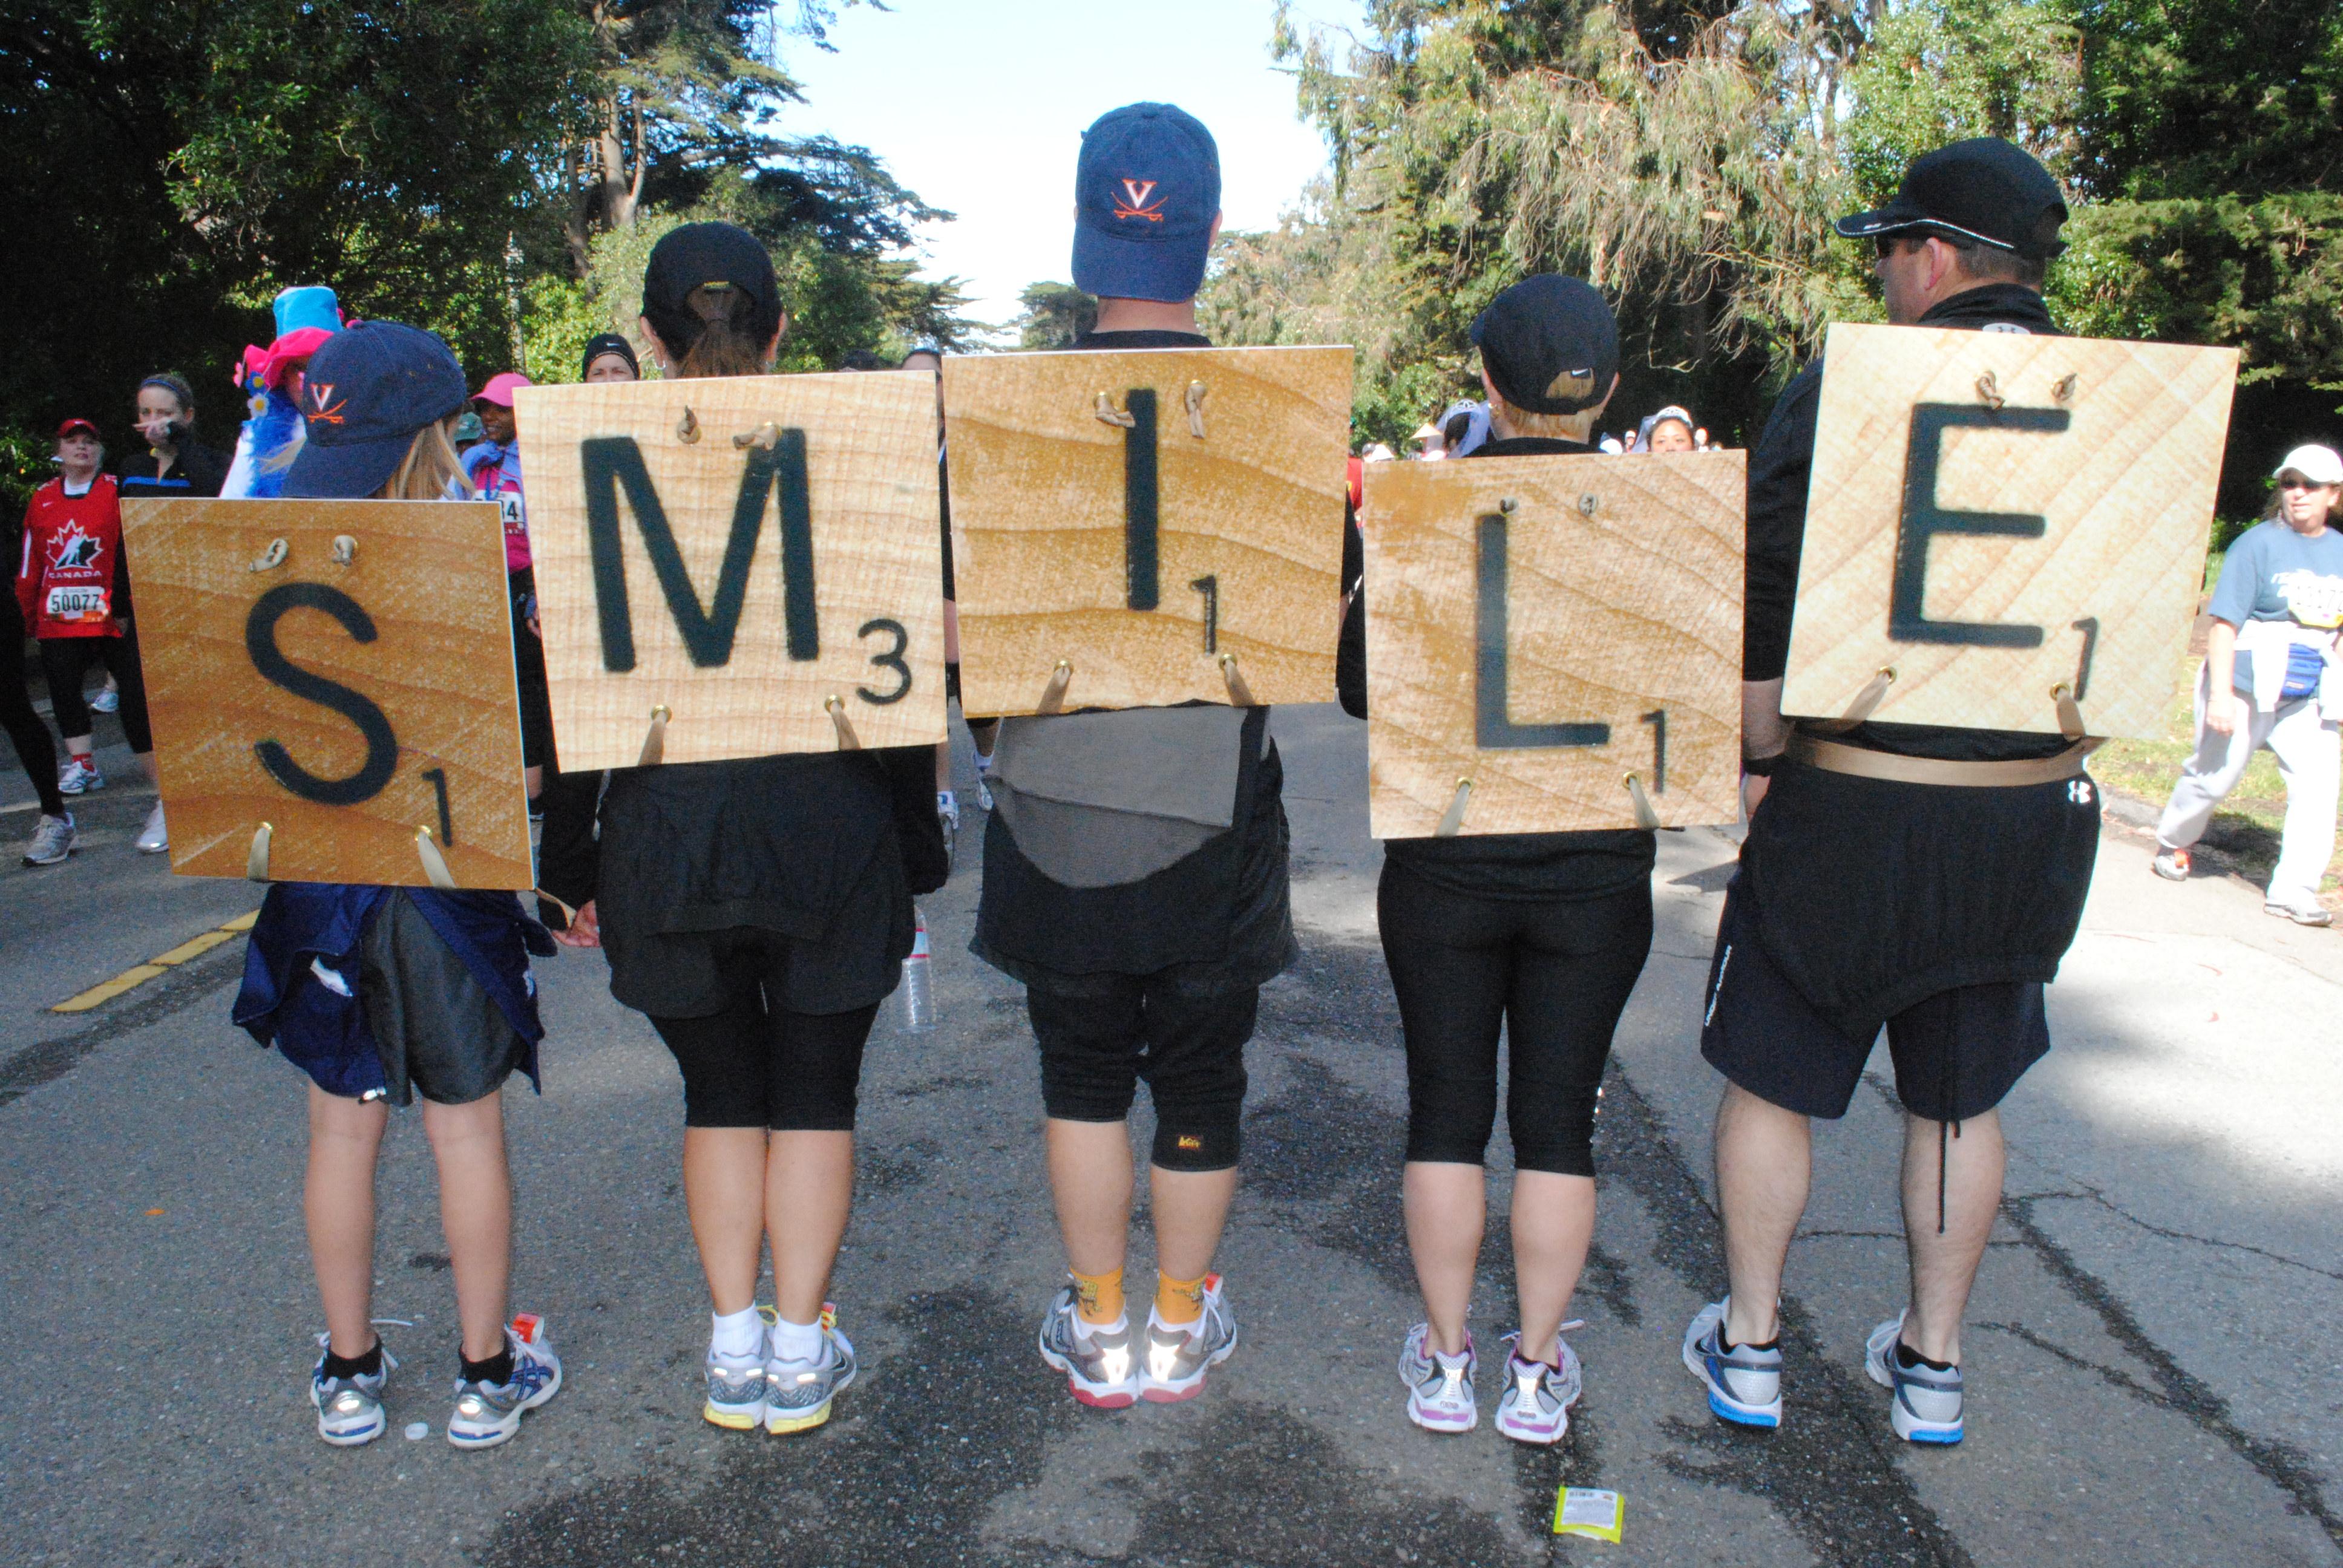 Scrabble tiles runners best race costumes for Diy scrabble costume